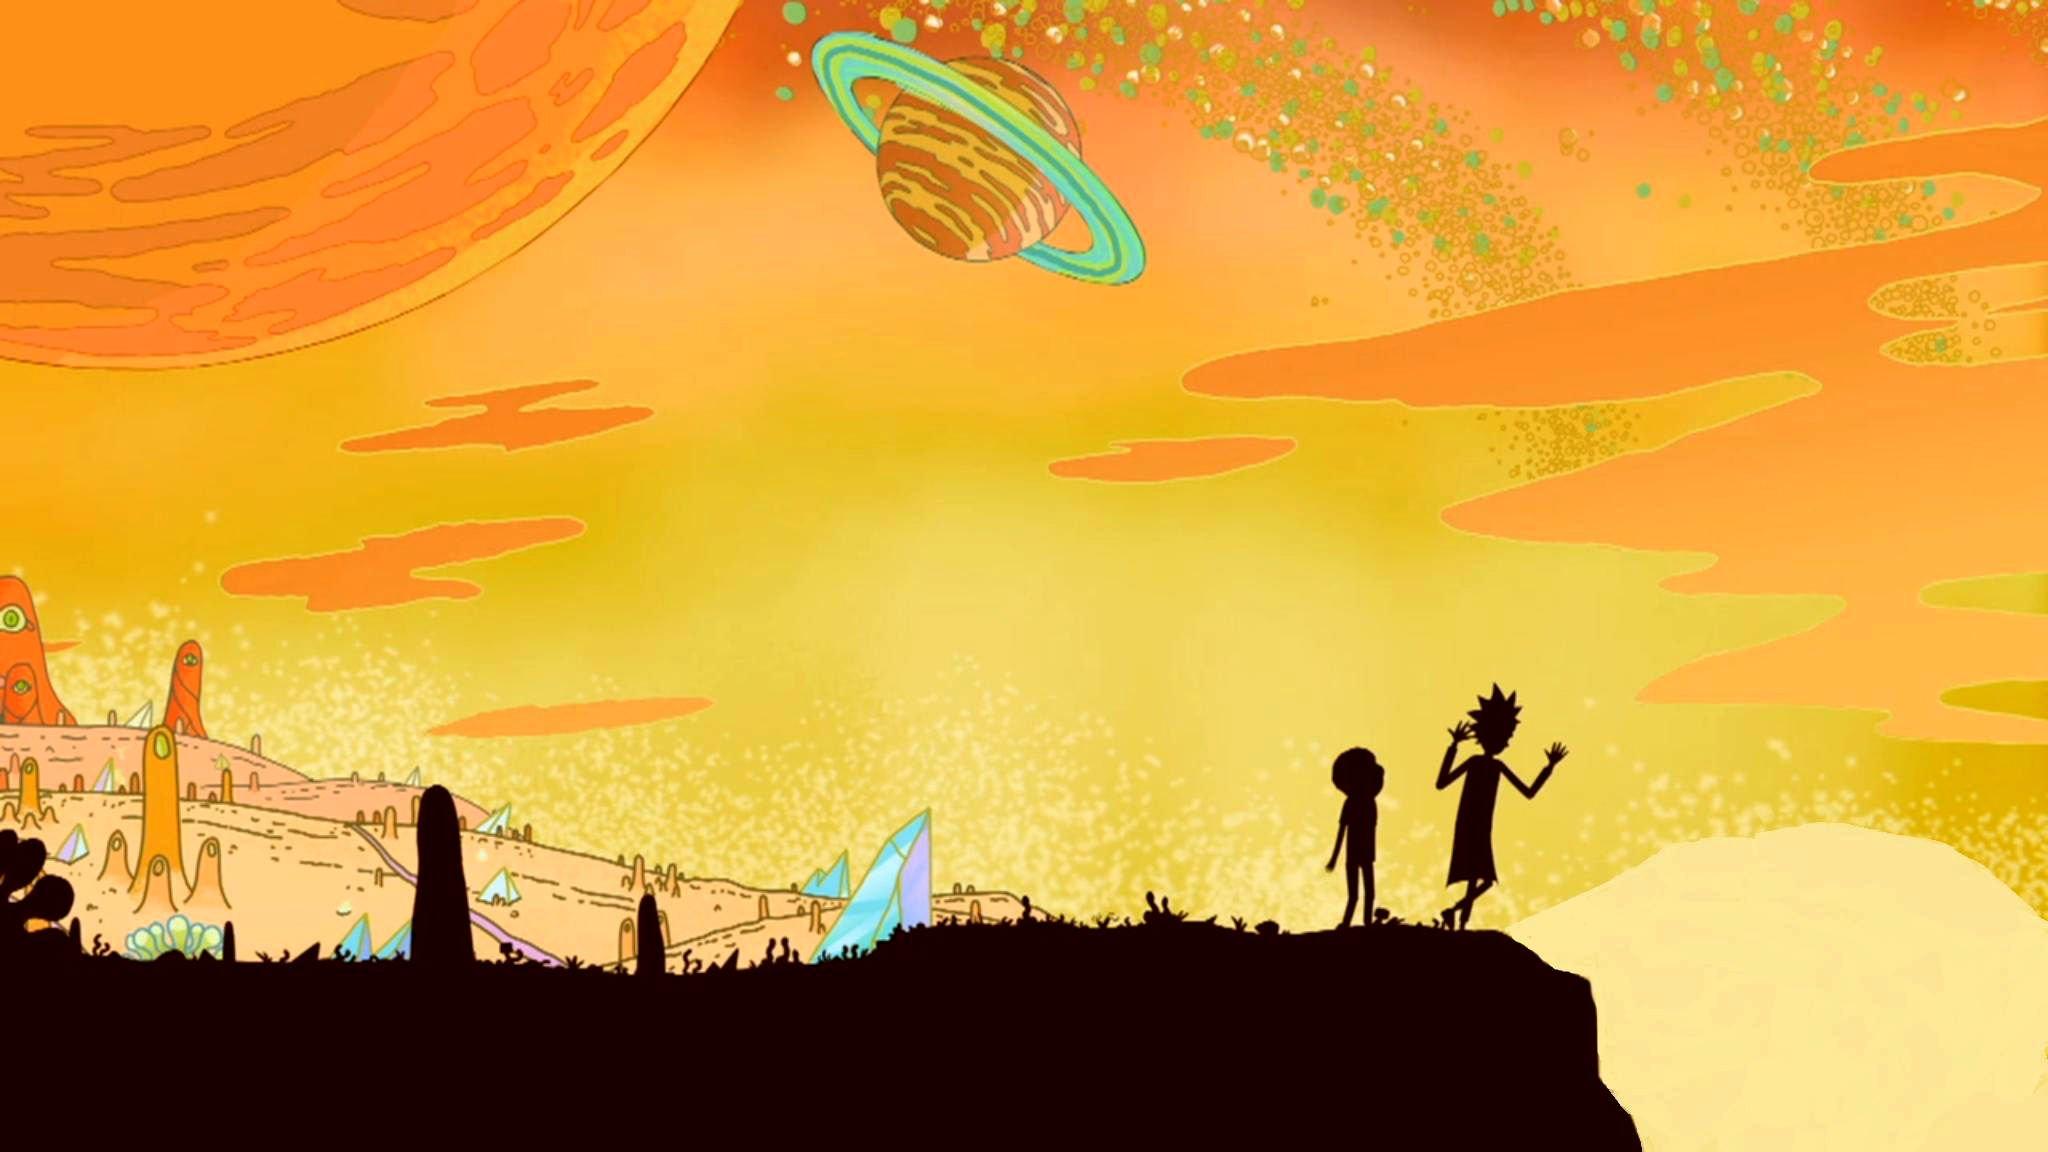 2048x1152 Cartoon Wallpaper